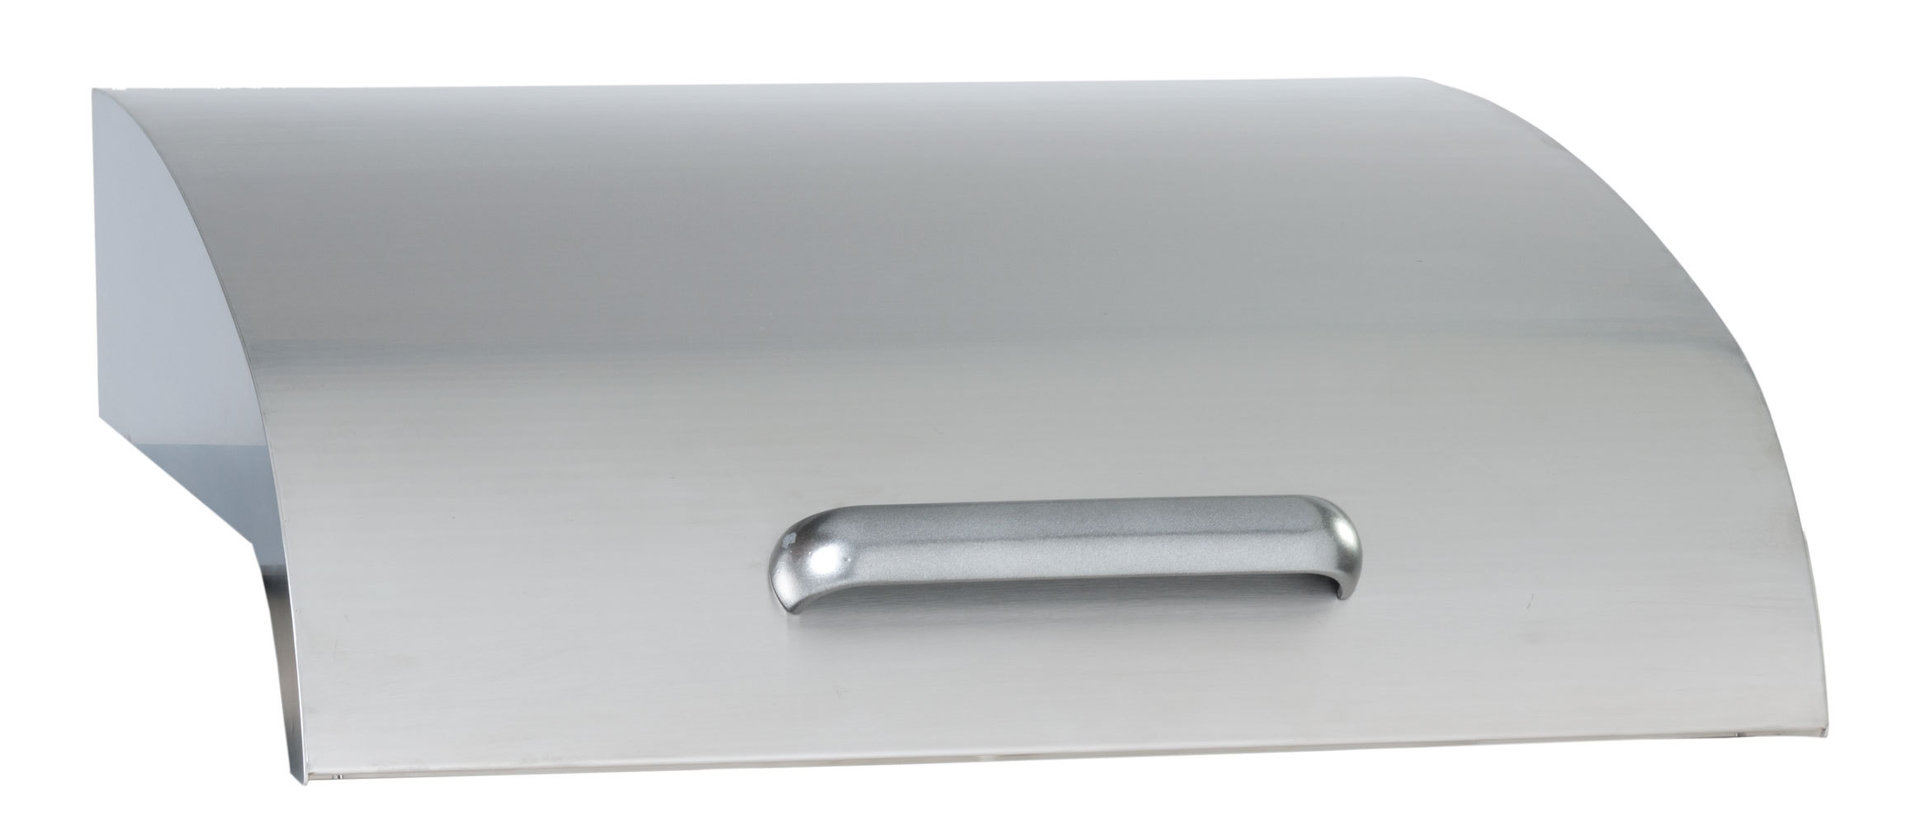 Tapa acero inoxidable para planchas innova 500 la mejor - Plancha de acero inoxidable precio ...